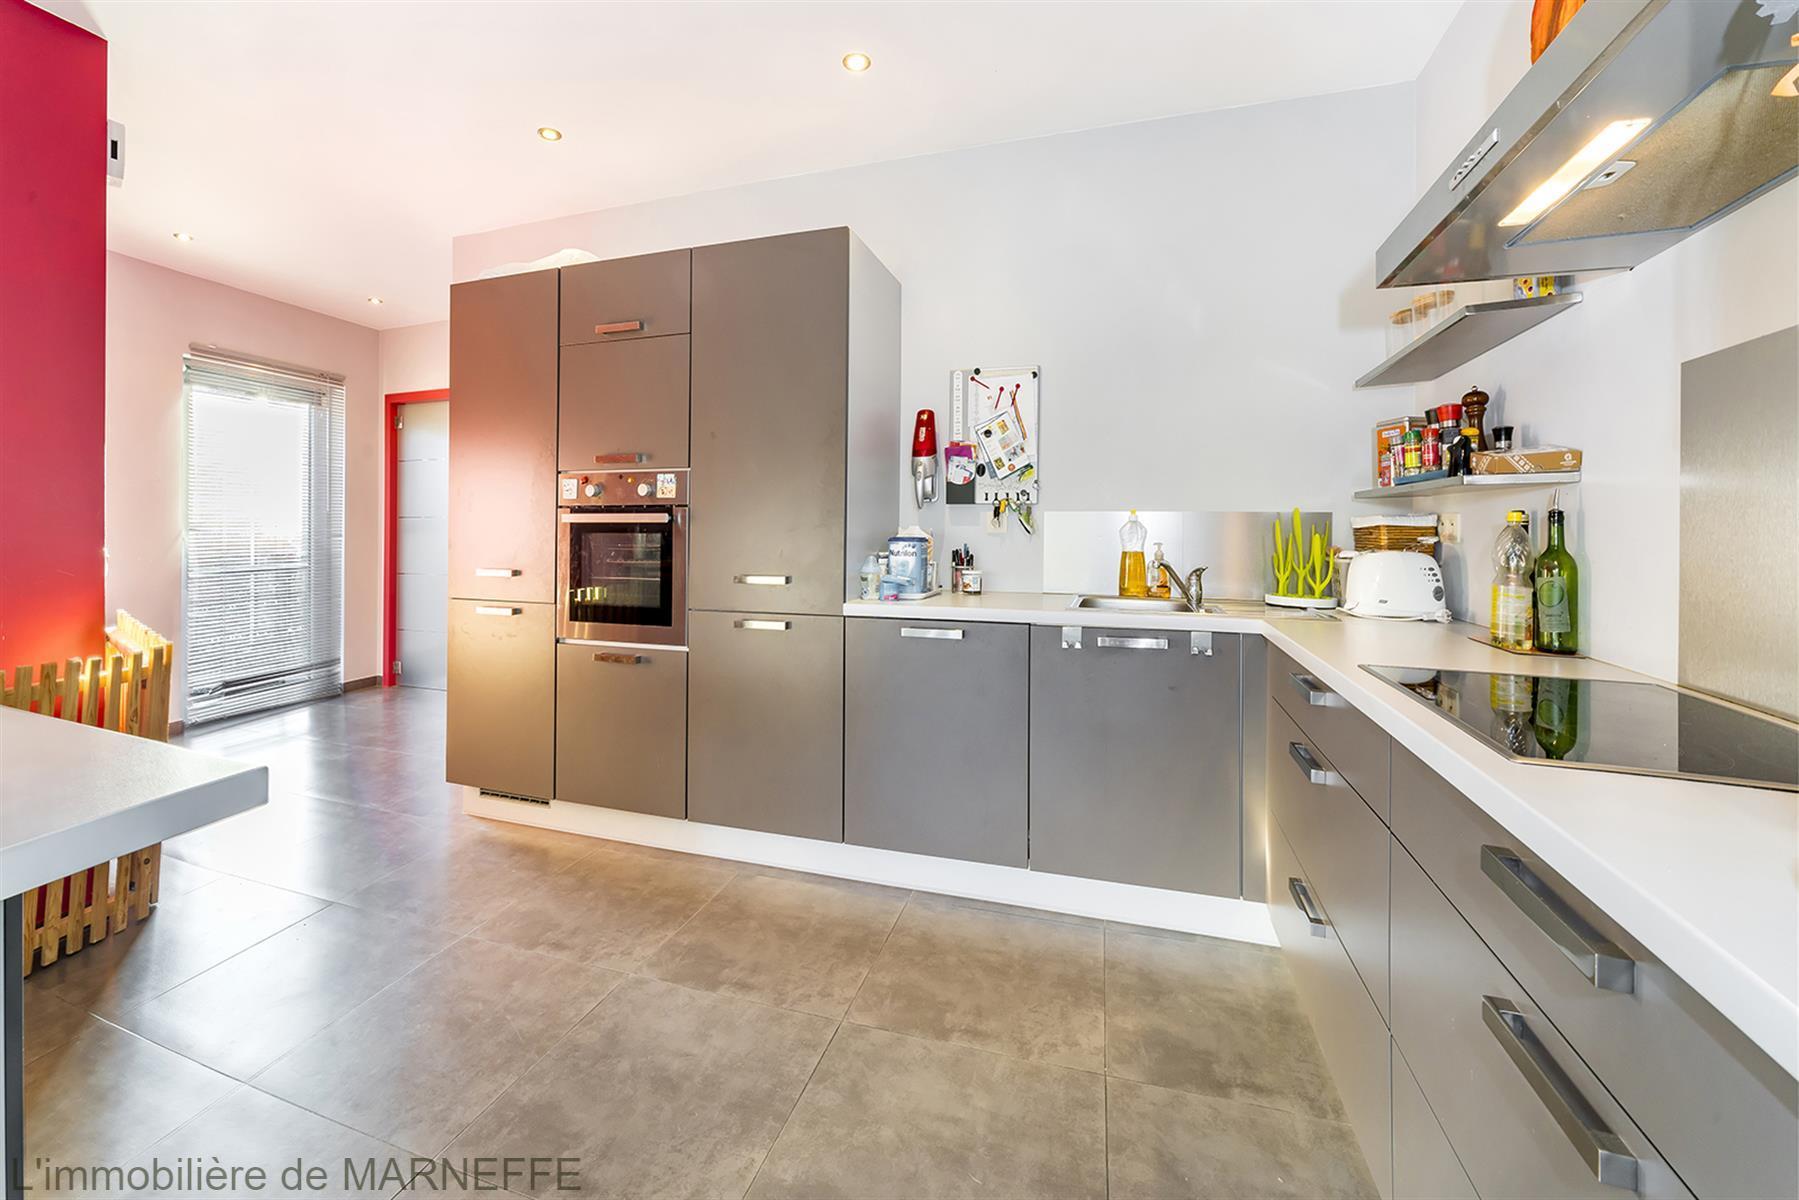 Appartement avec jardin - Orp-Jauche - #3625402-7